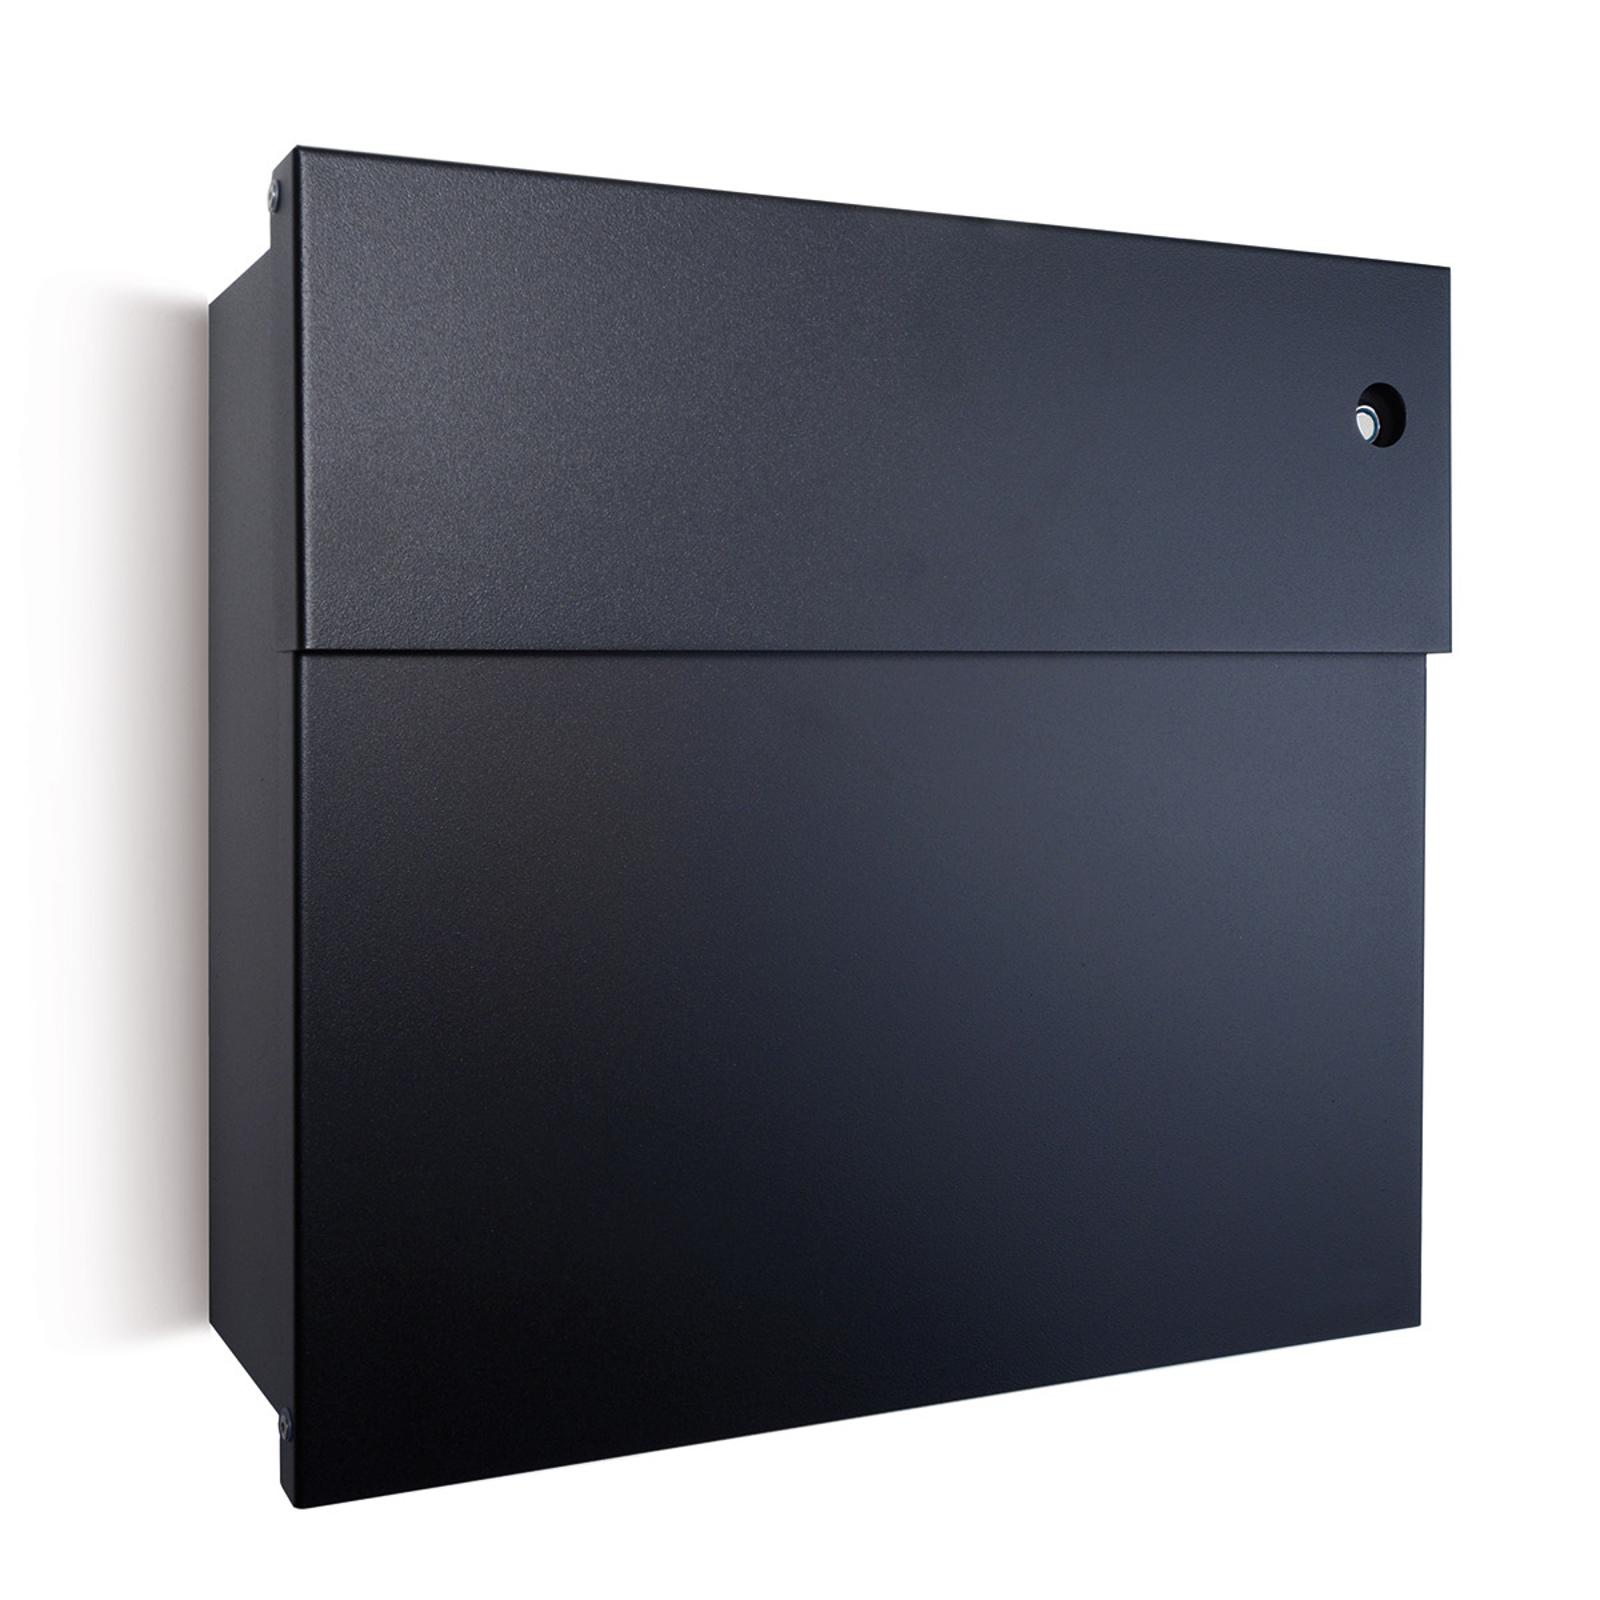 Letterman IV letterbox, blue doorbell, black_1057153_1